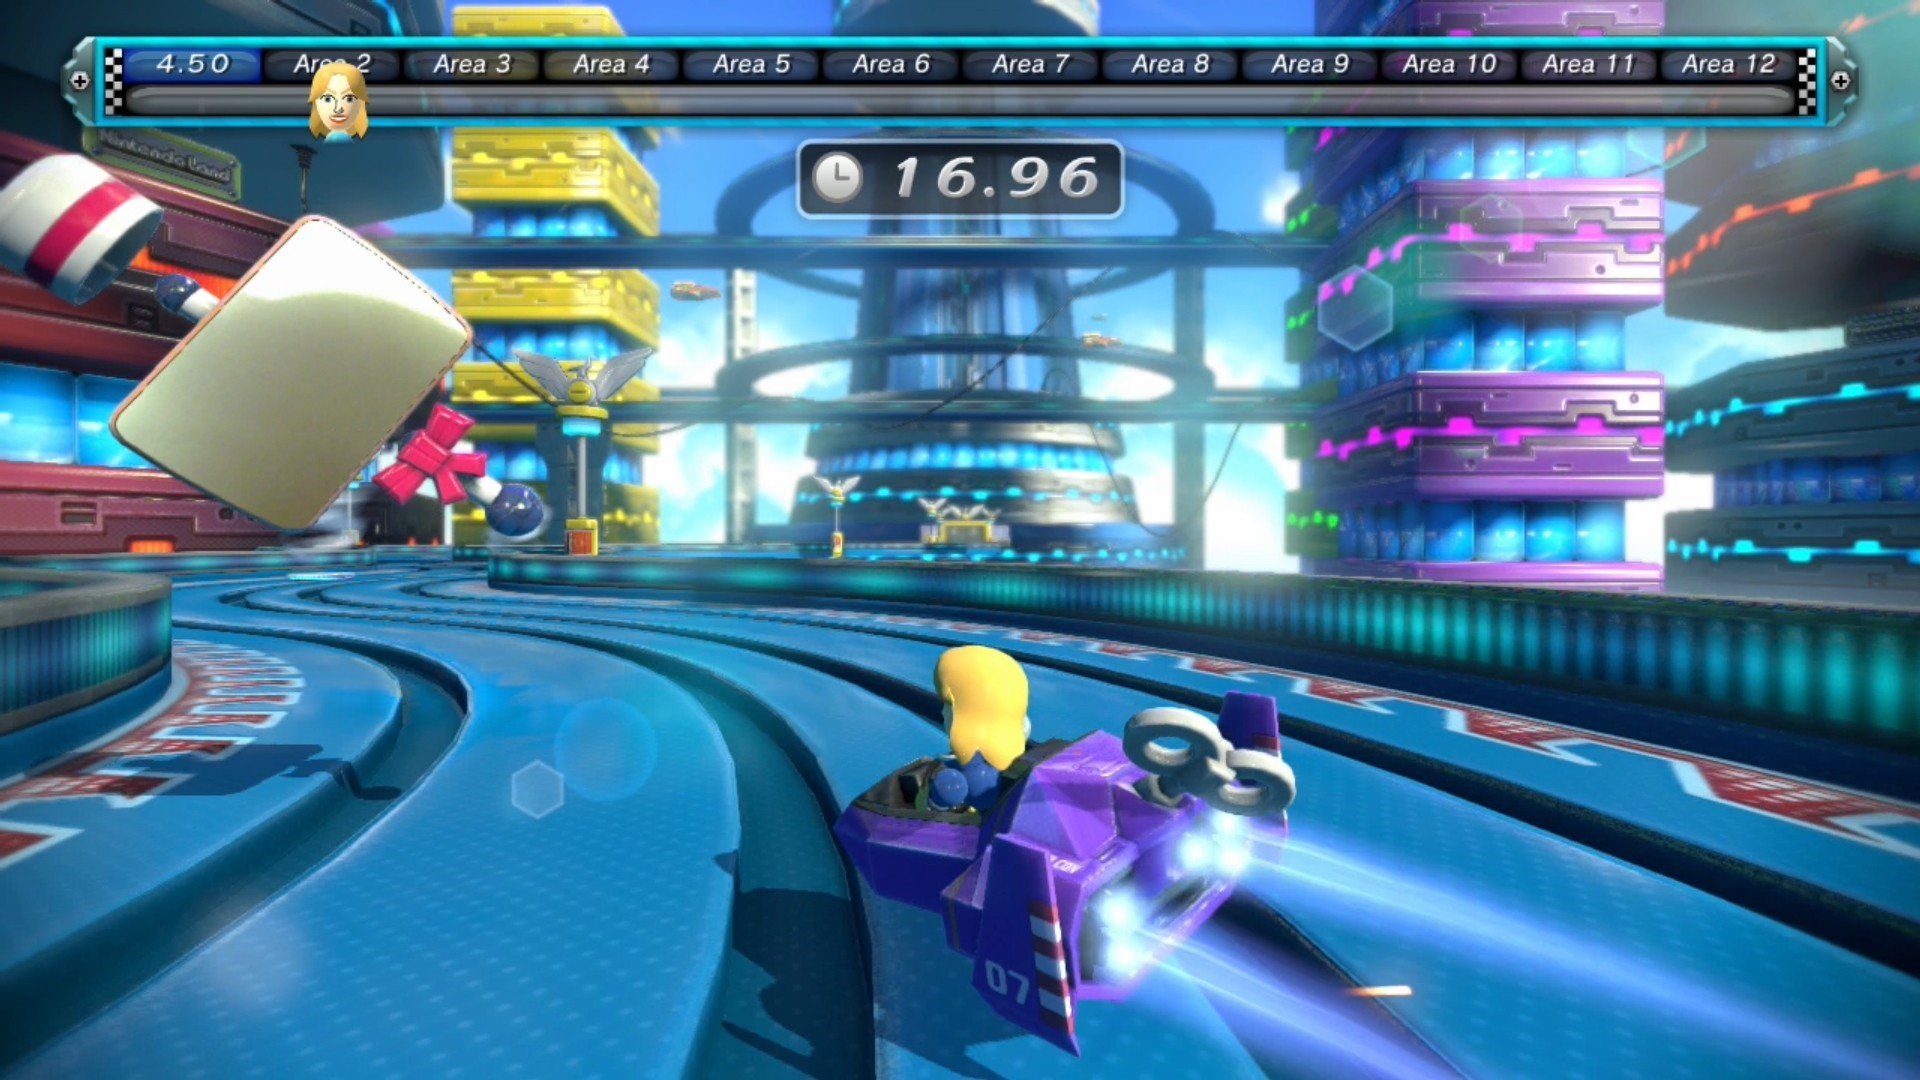 Nintendo Land Wii U 2012 (13)